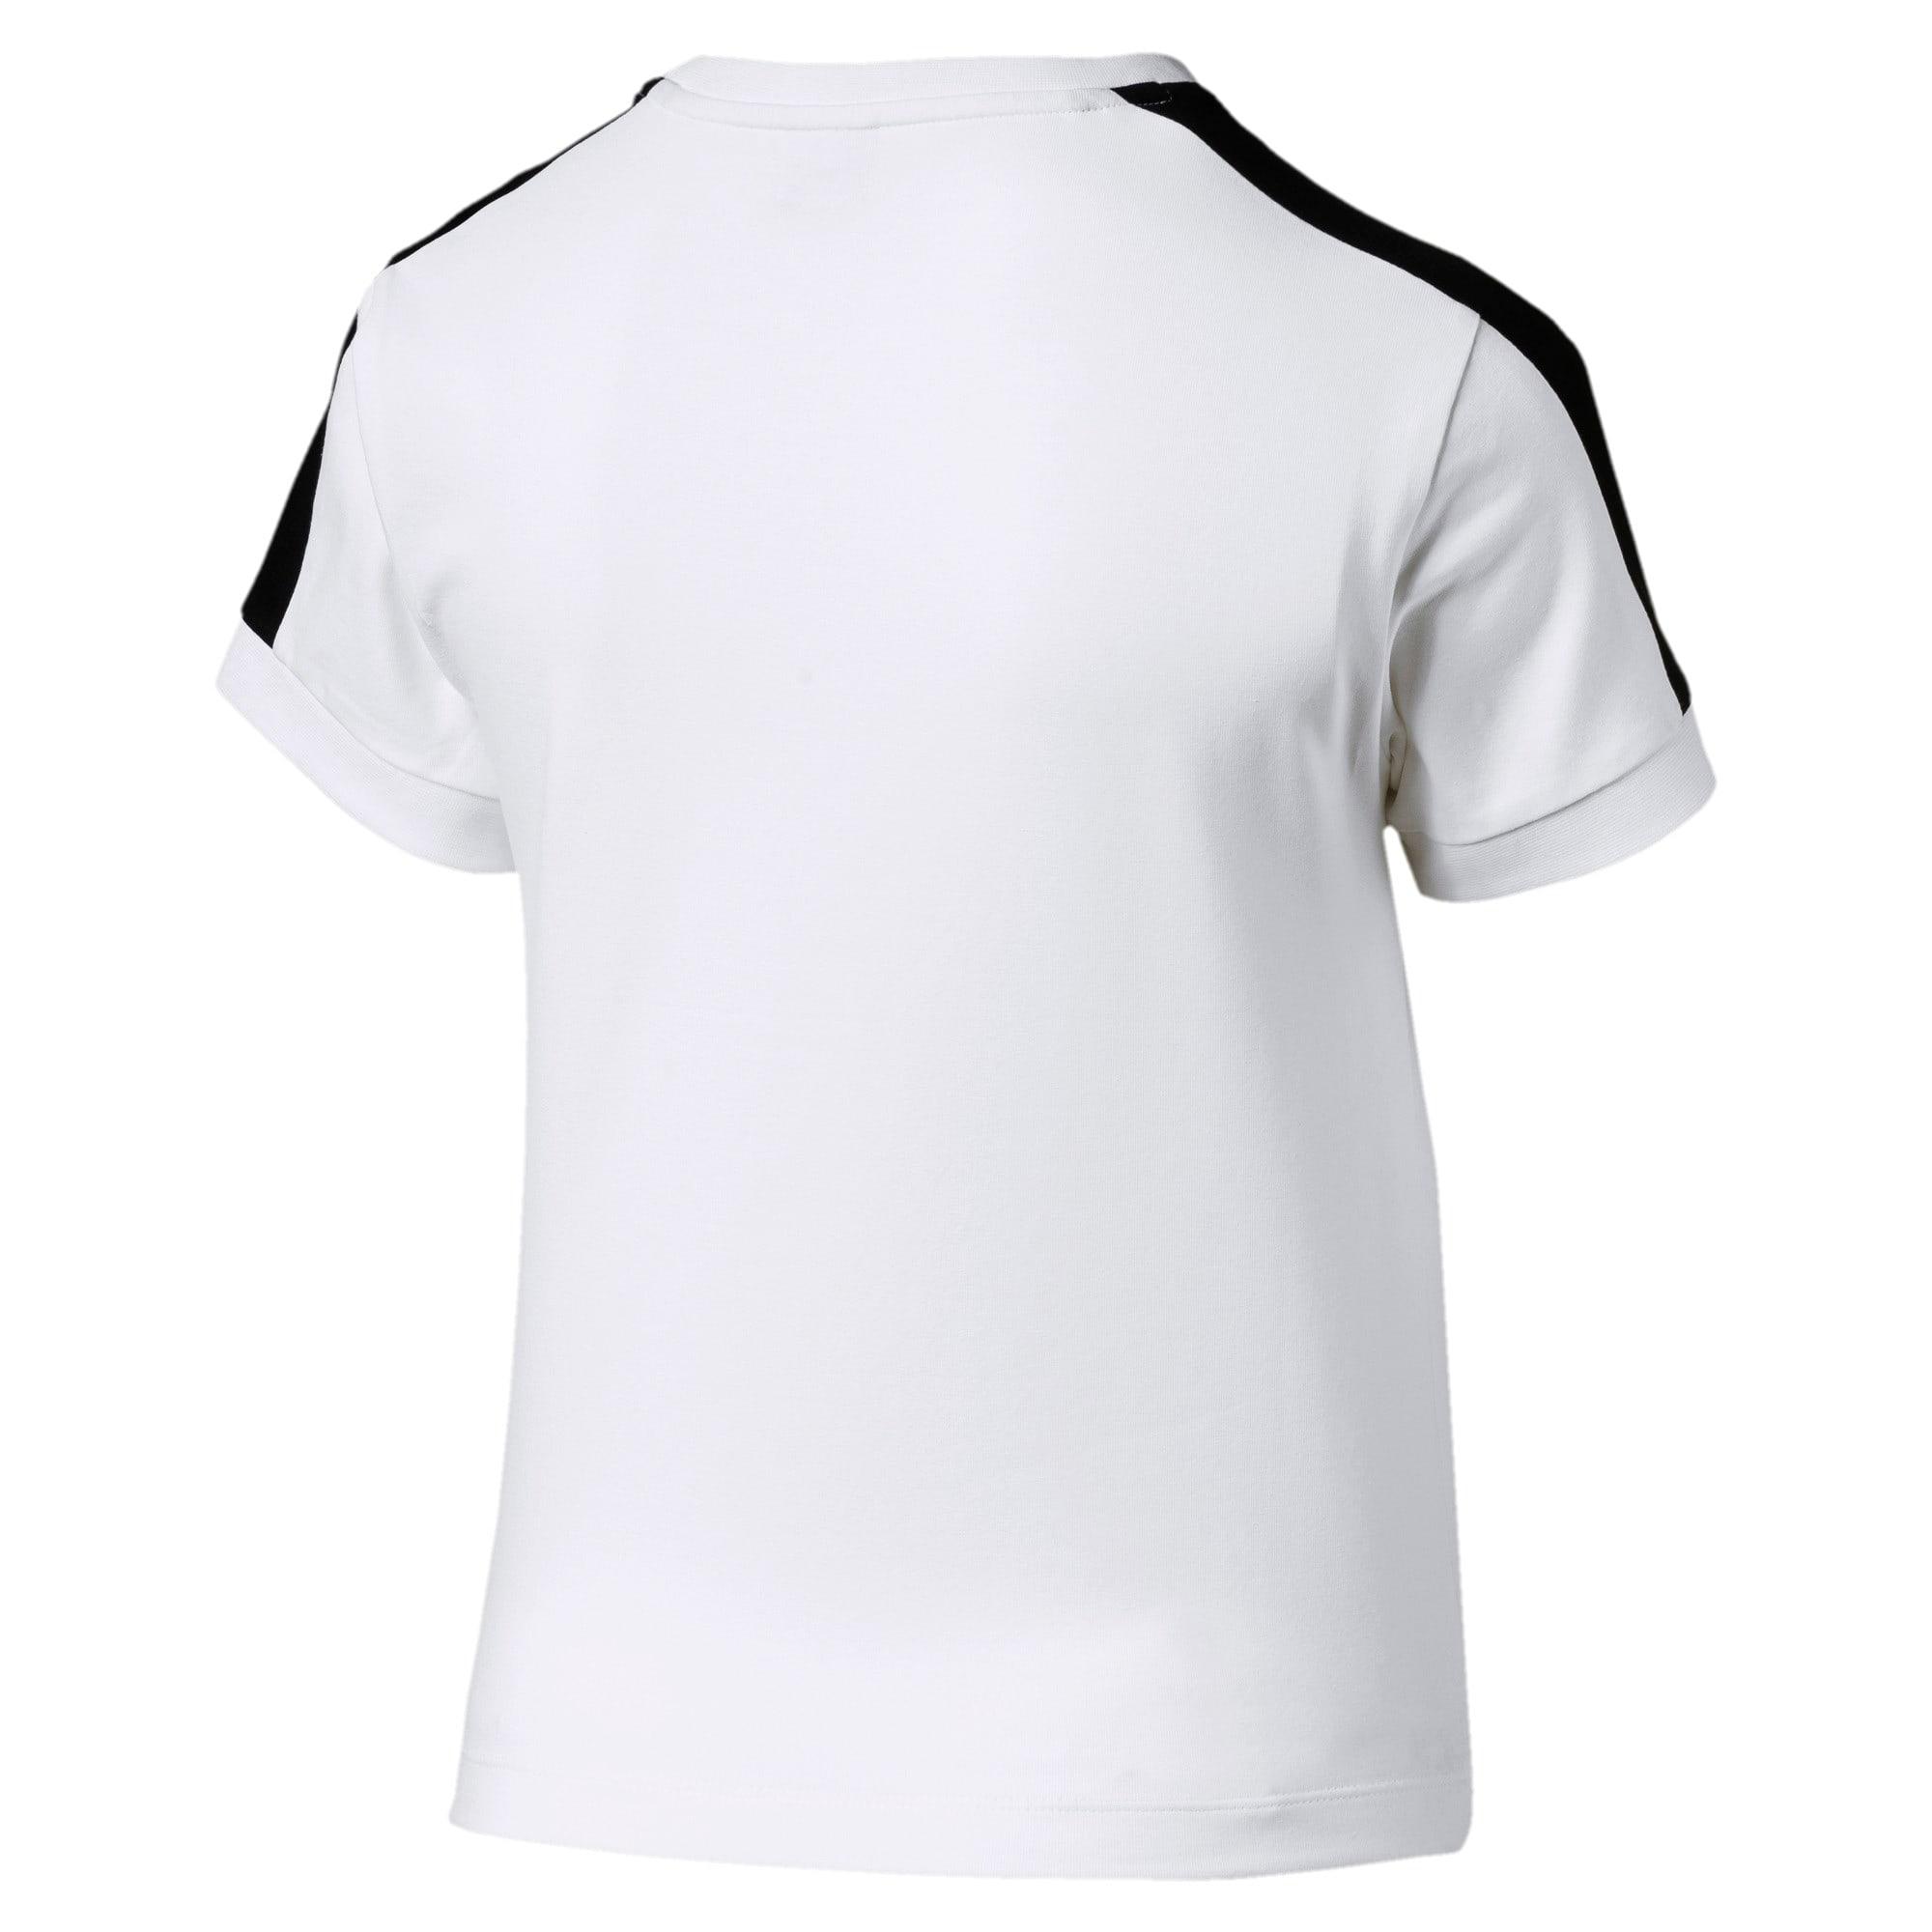 Thumbnail 4 of CLASSICS タイト ウィメンズ SS Tシャツ 半袖, Puma White-black, medium-JPN